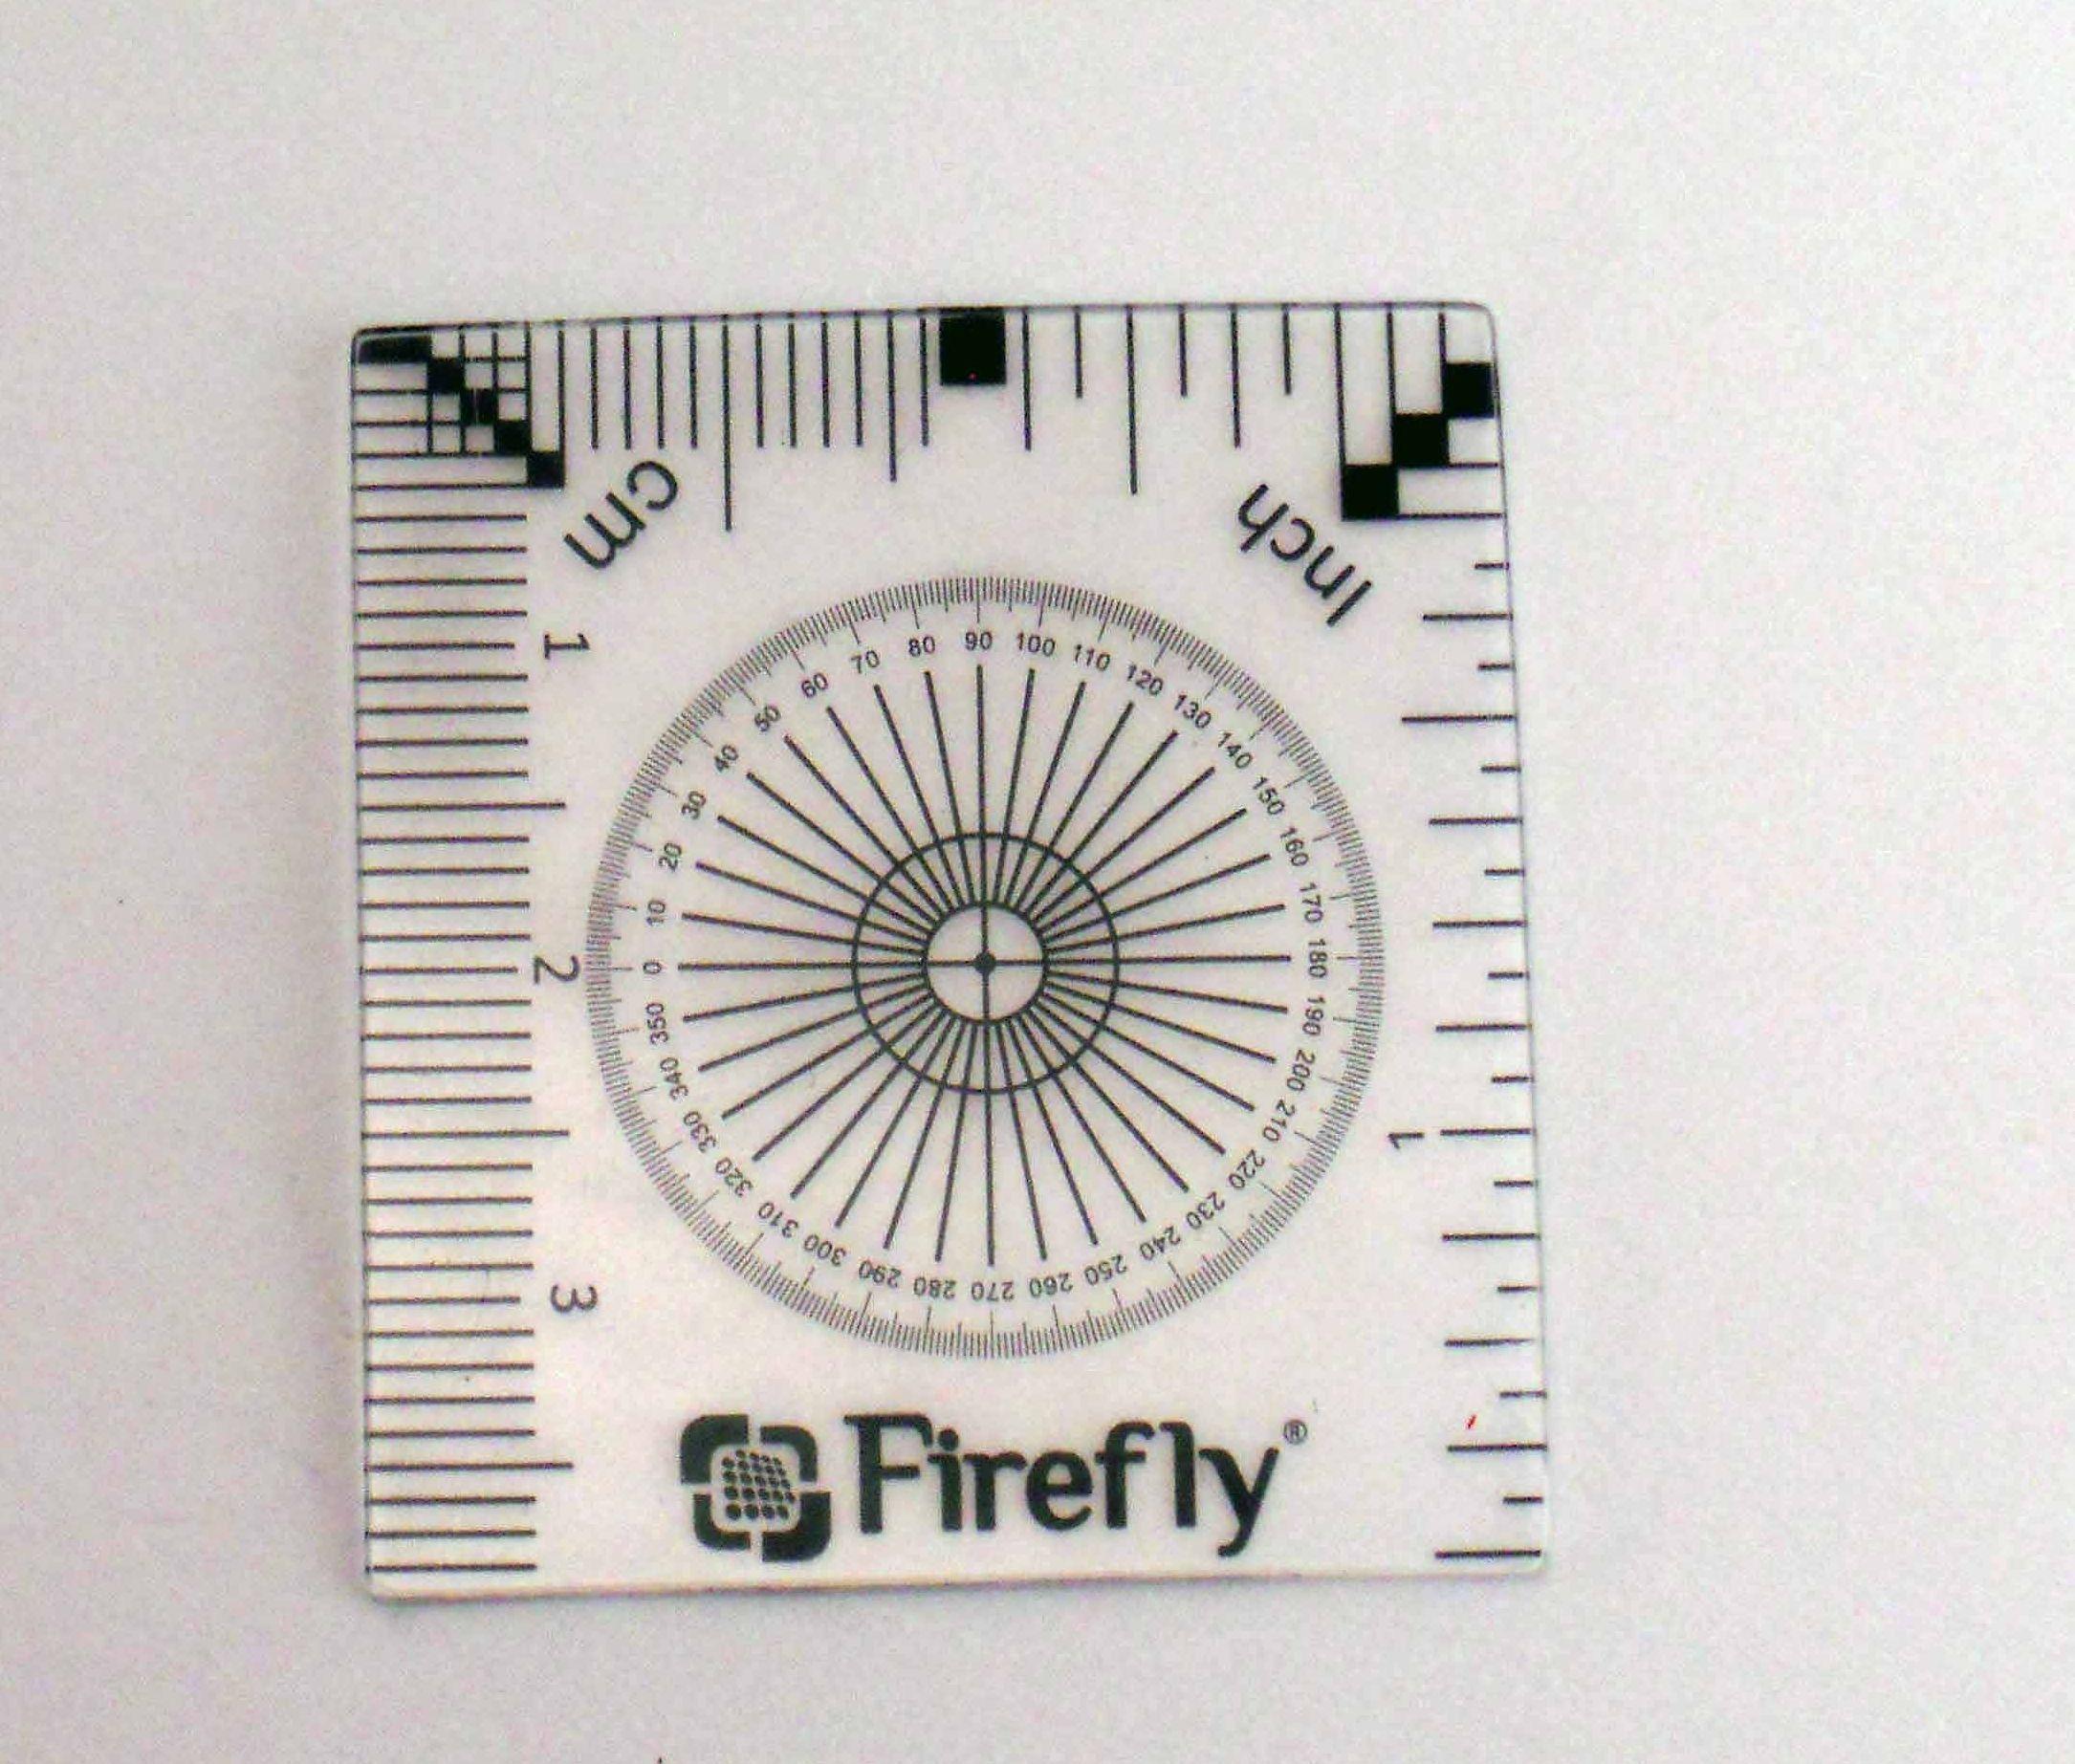 Calibration ruler - Accessoires Microscopes USB Firefly